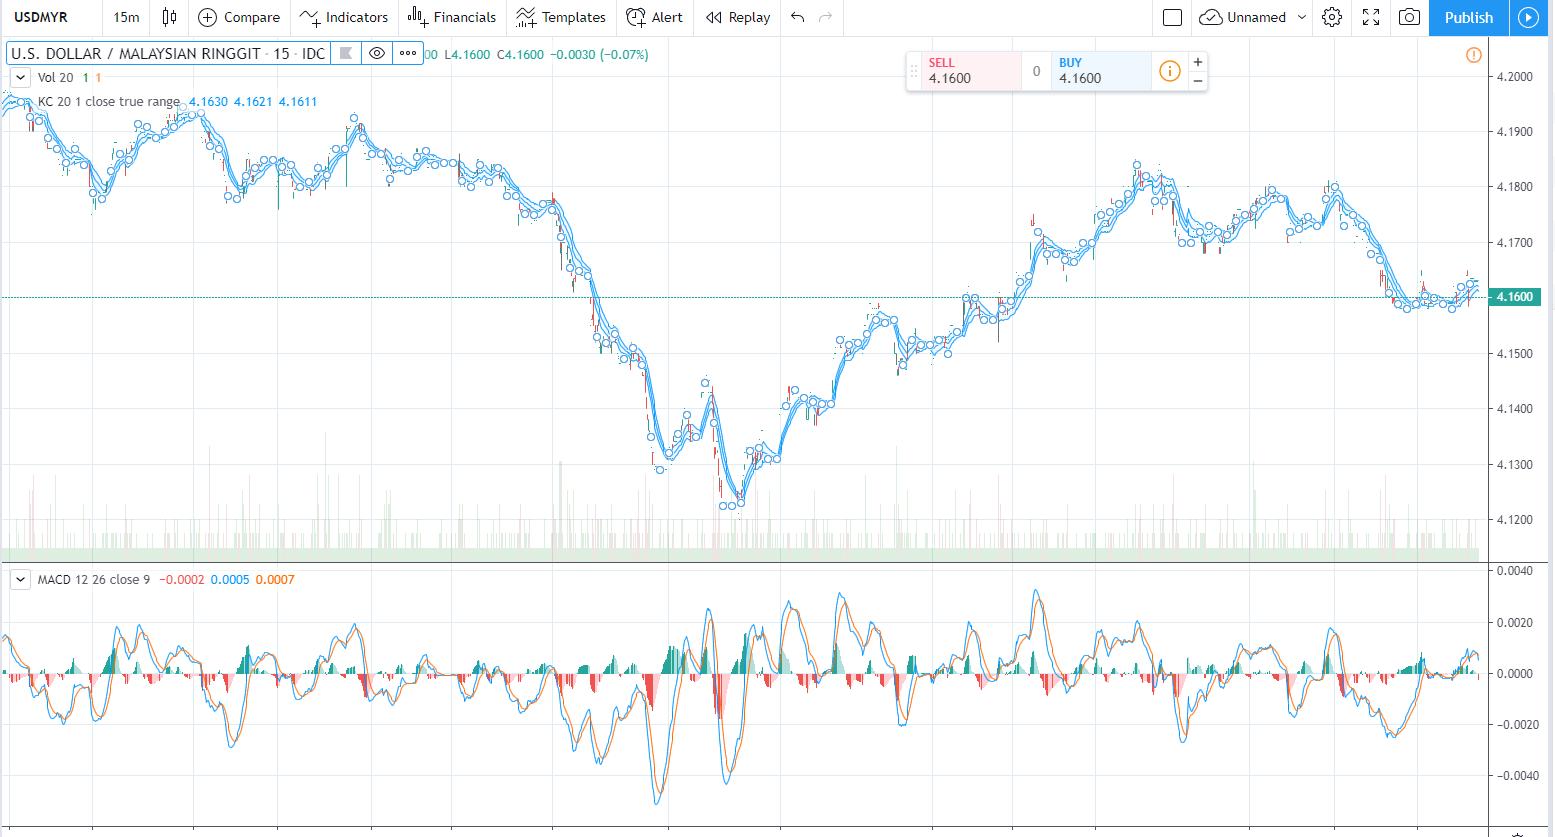 USDMYR Chart, Source: TradingView